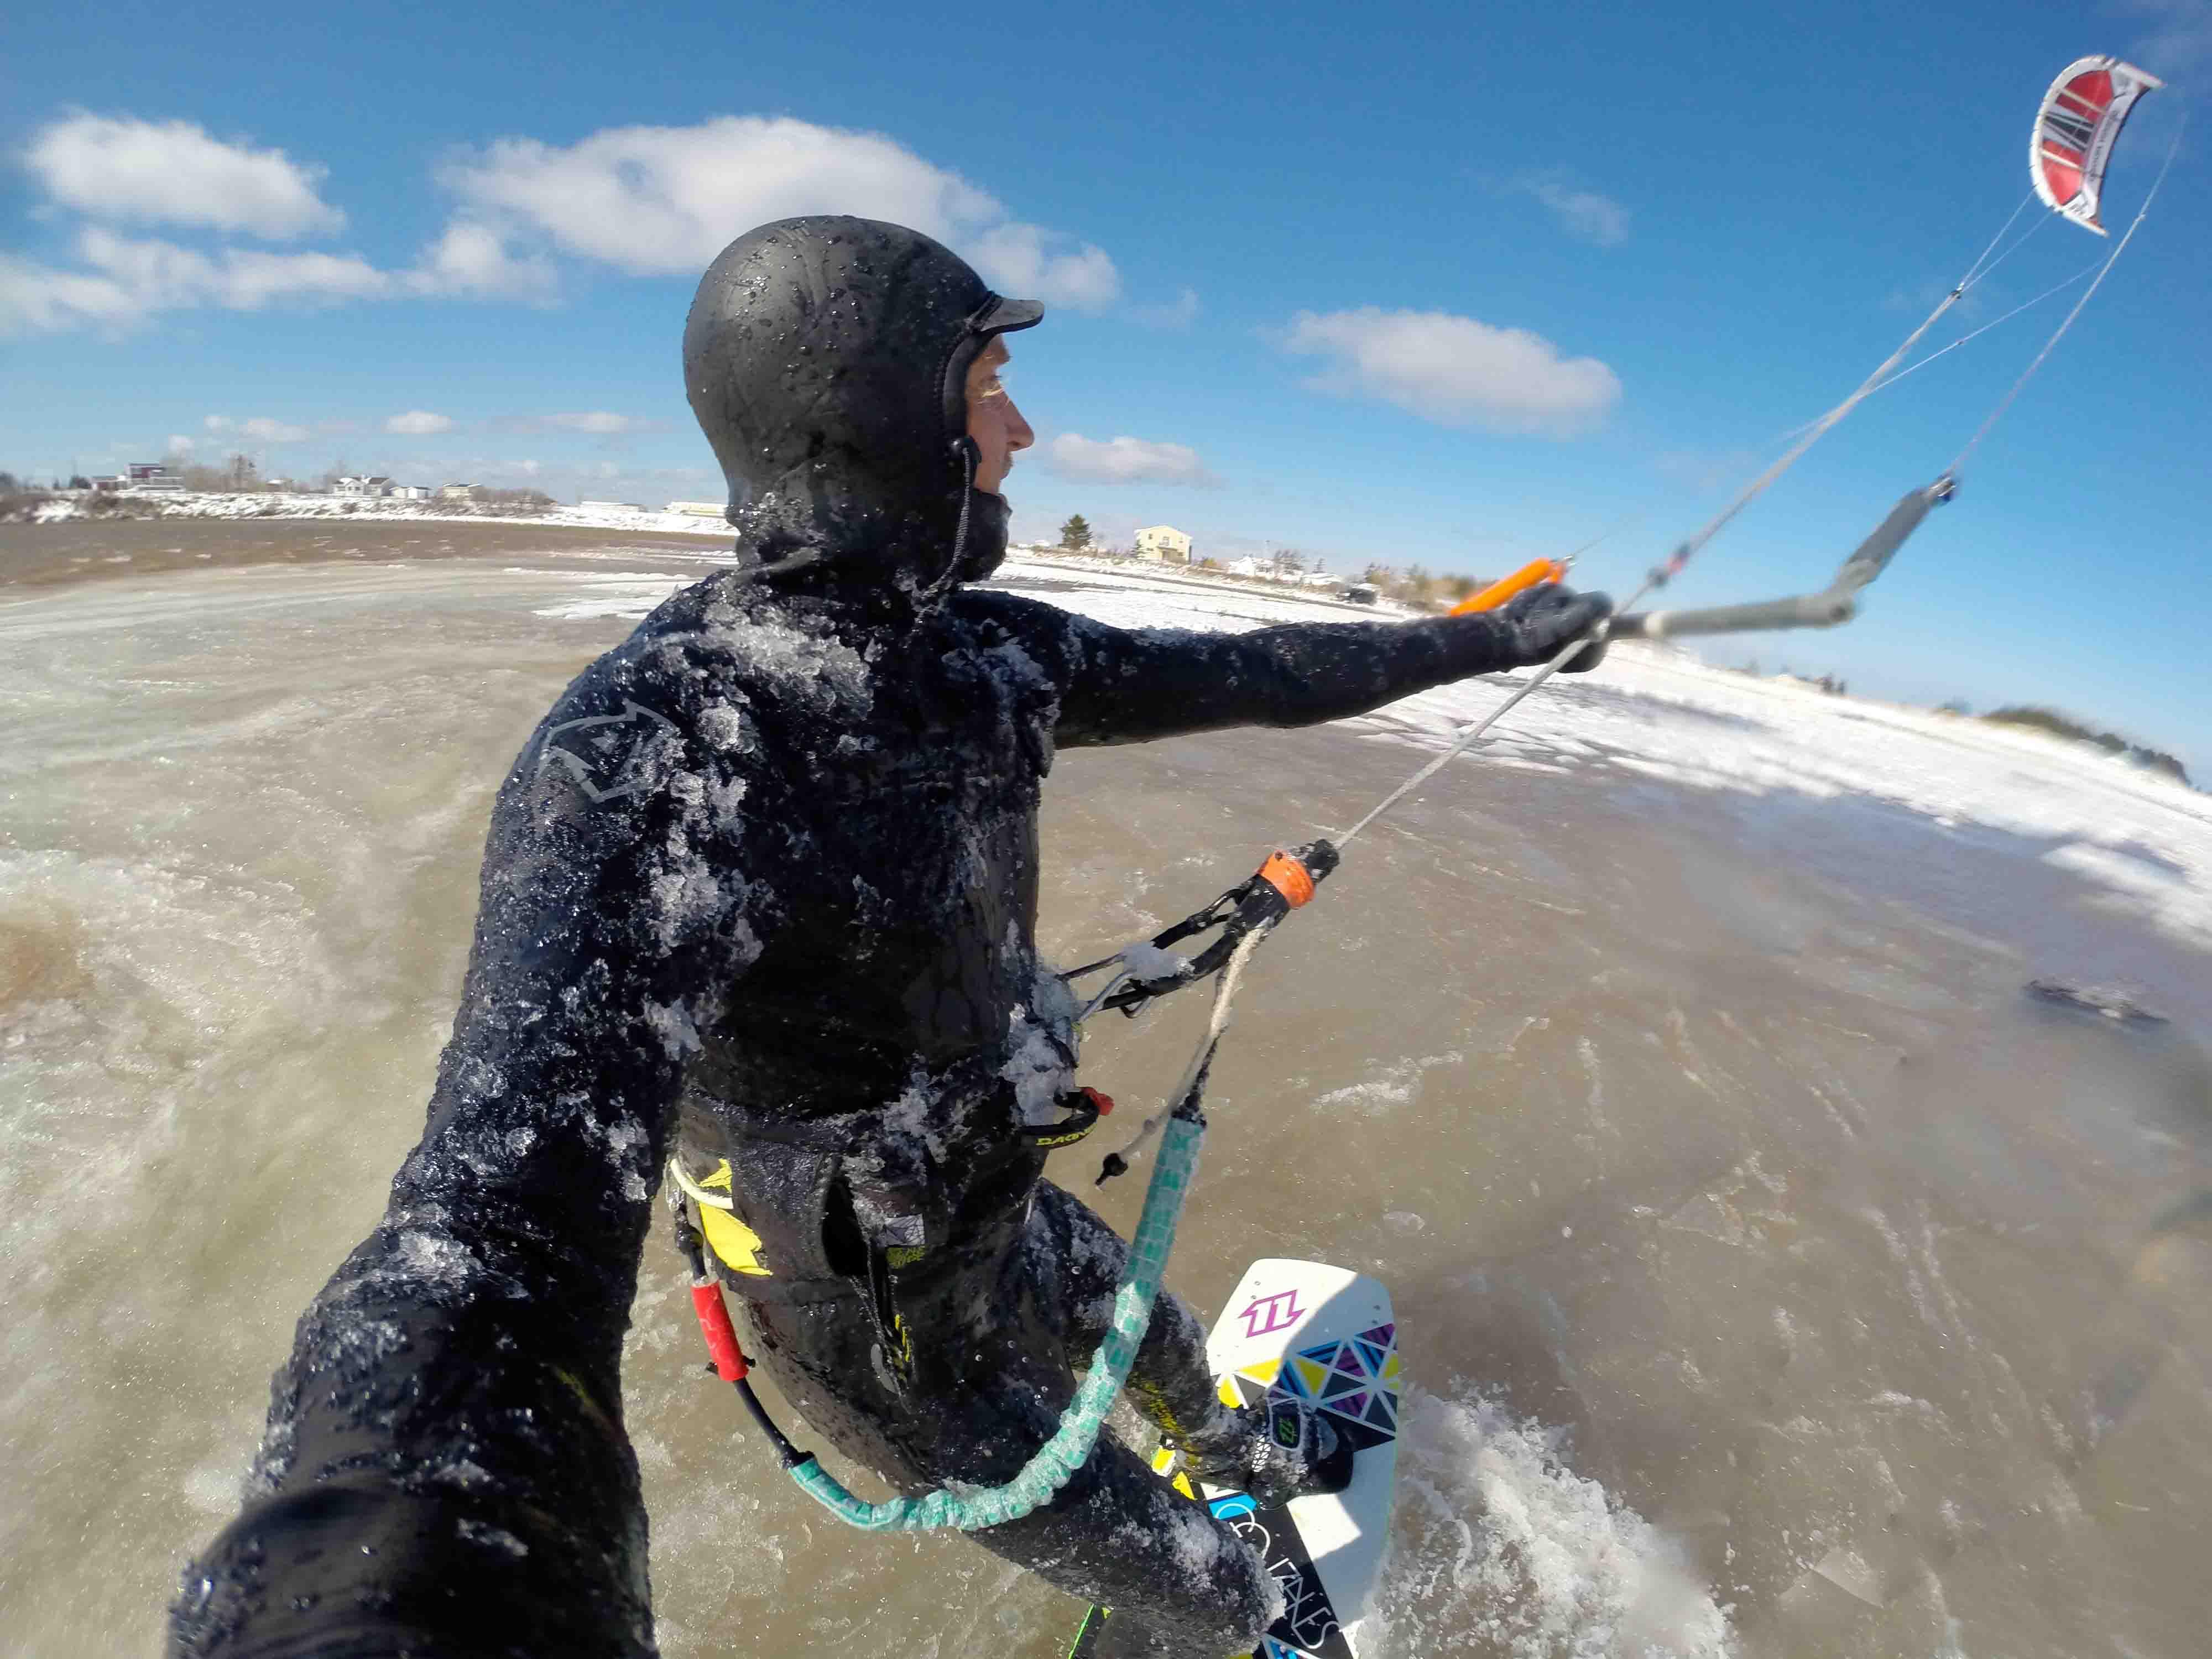 novascotiakitesurfing-9